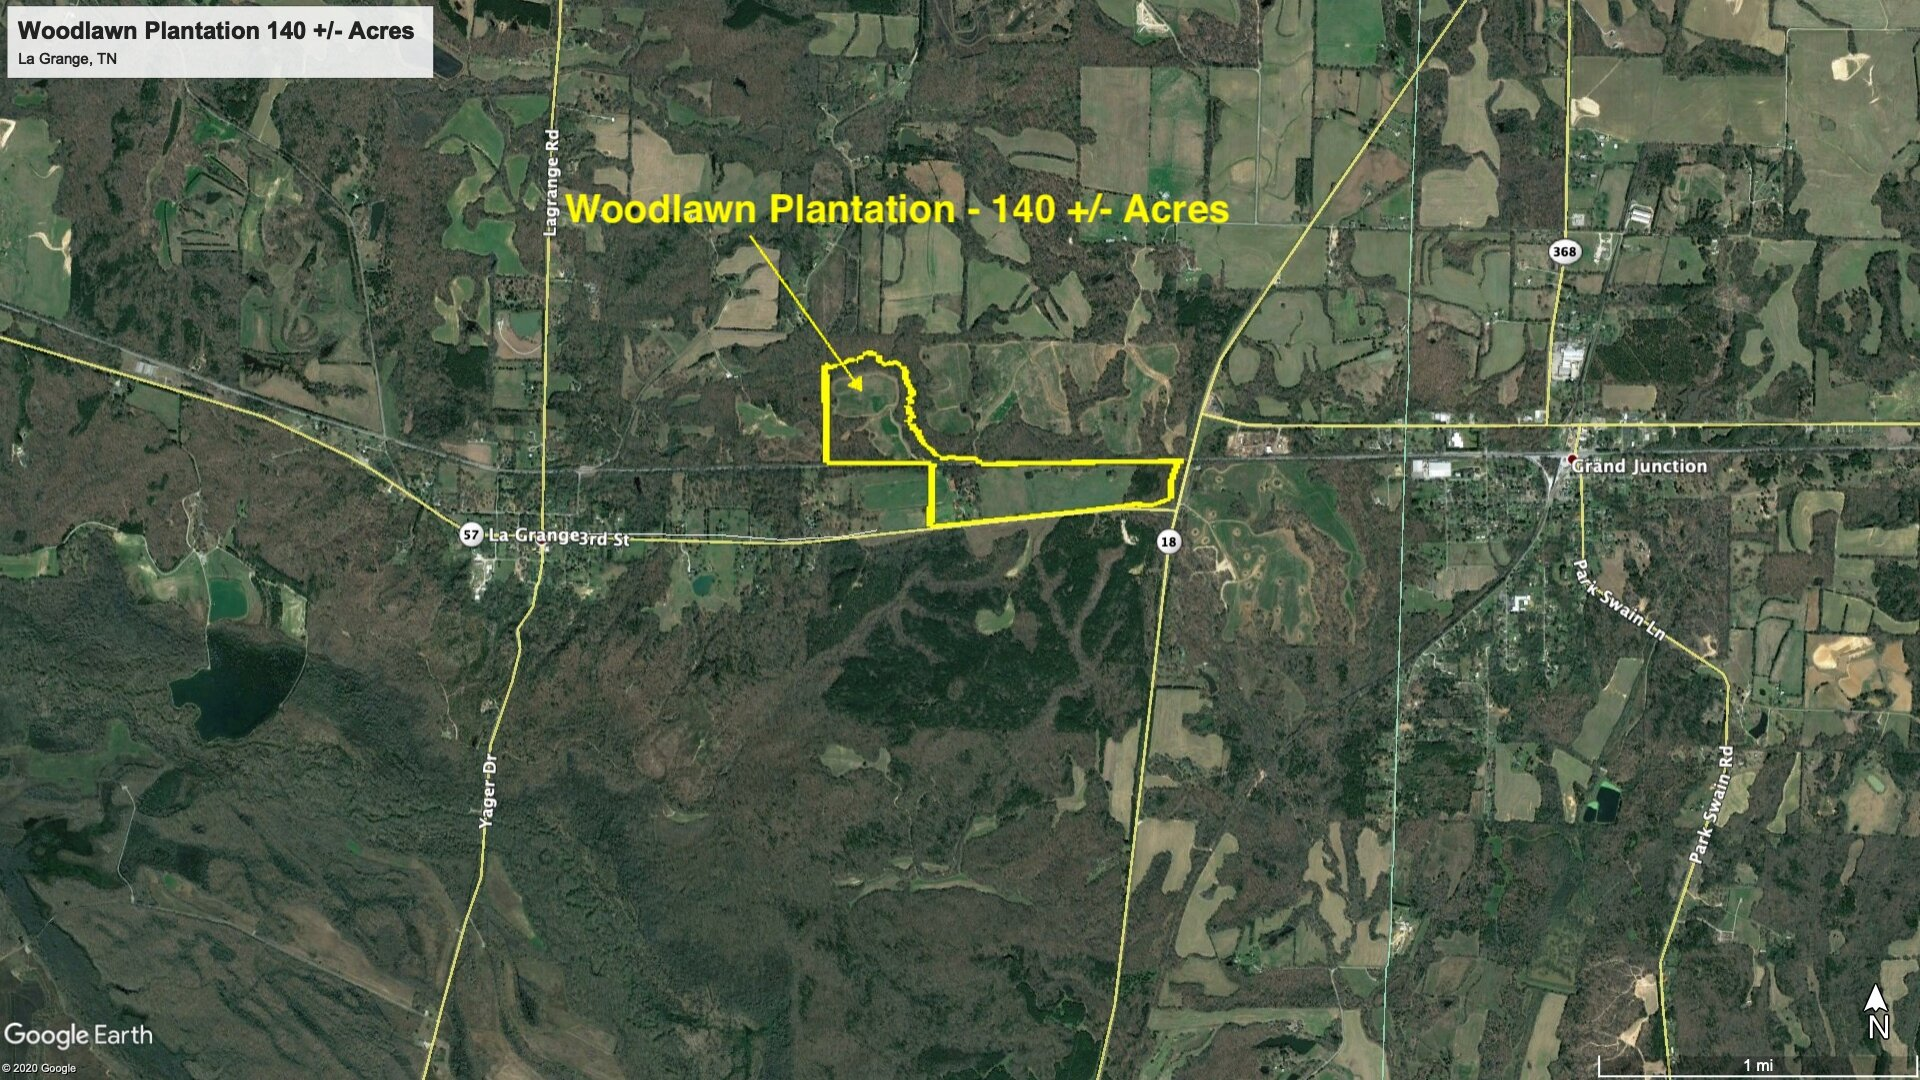 Woodlawn Plantation  140 +:- Acres - Mid View.jpg